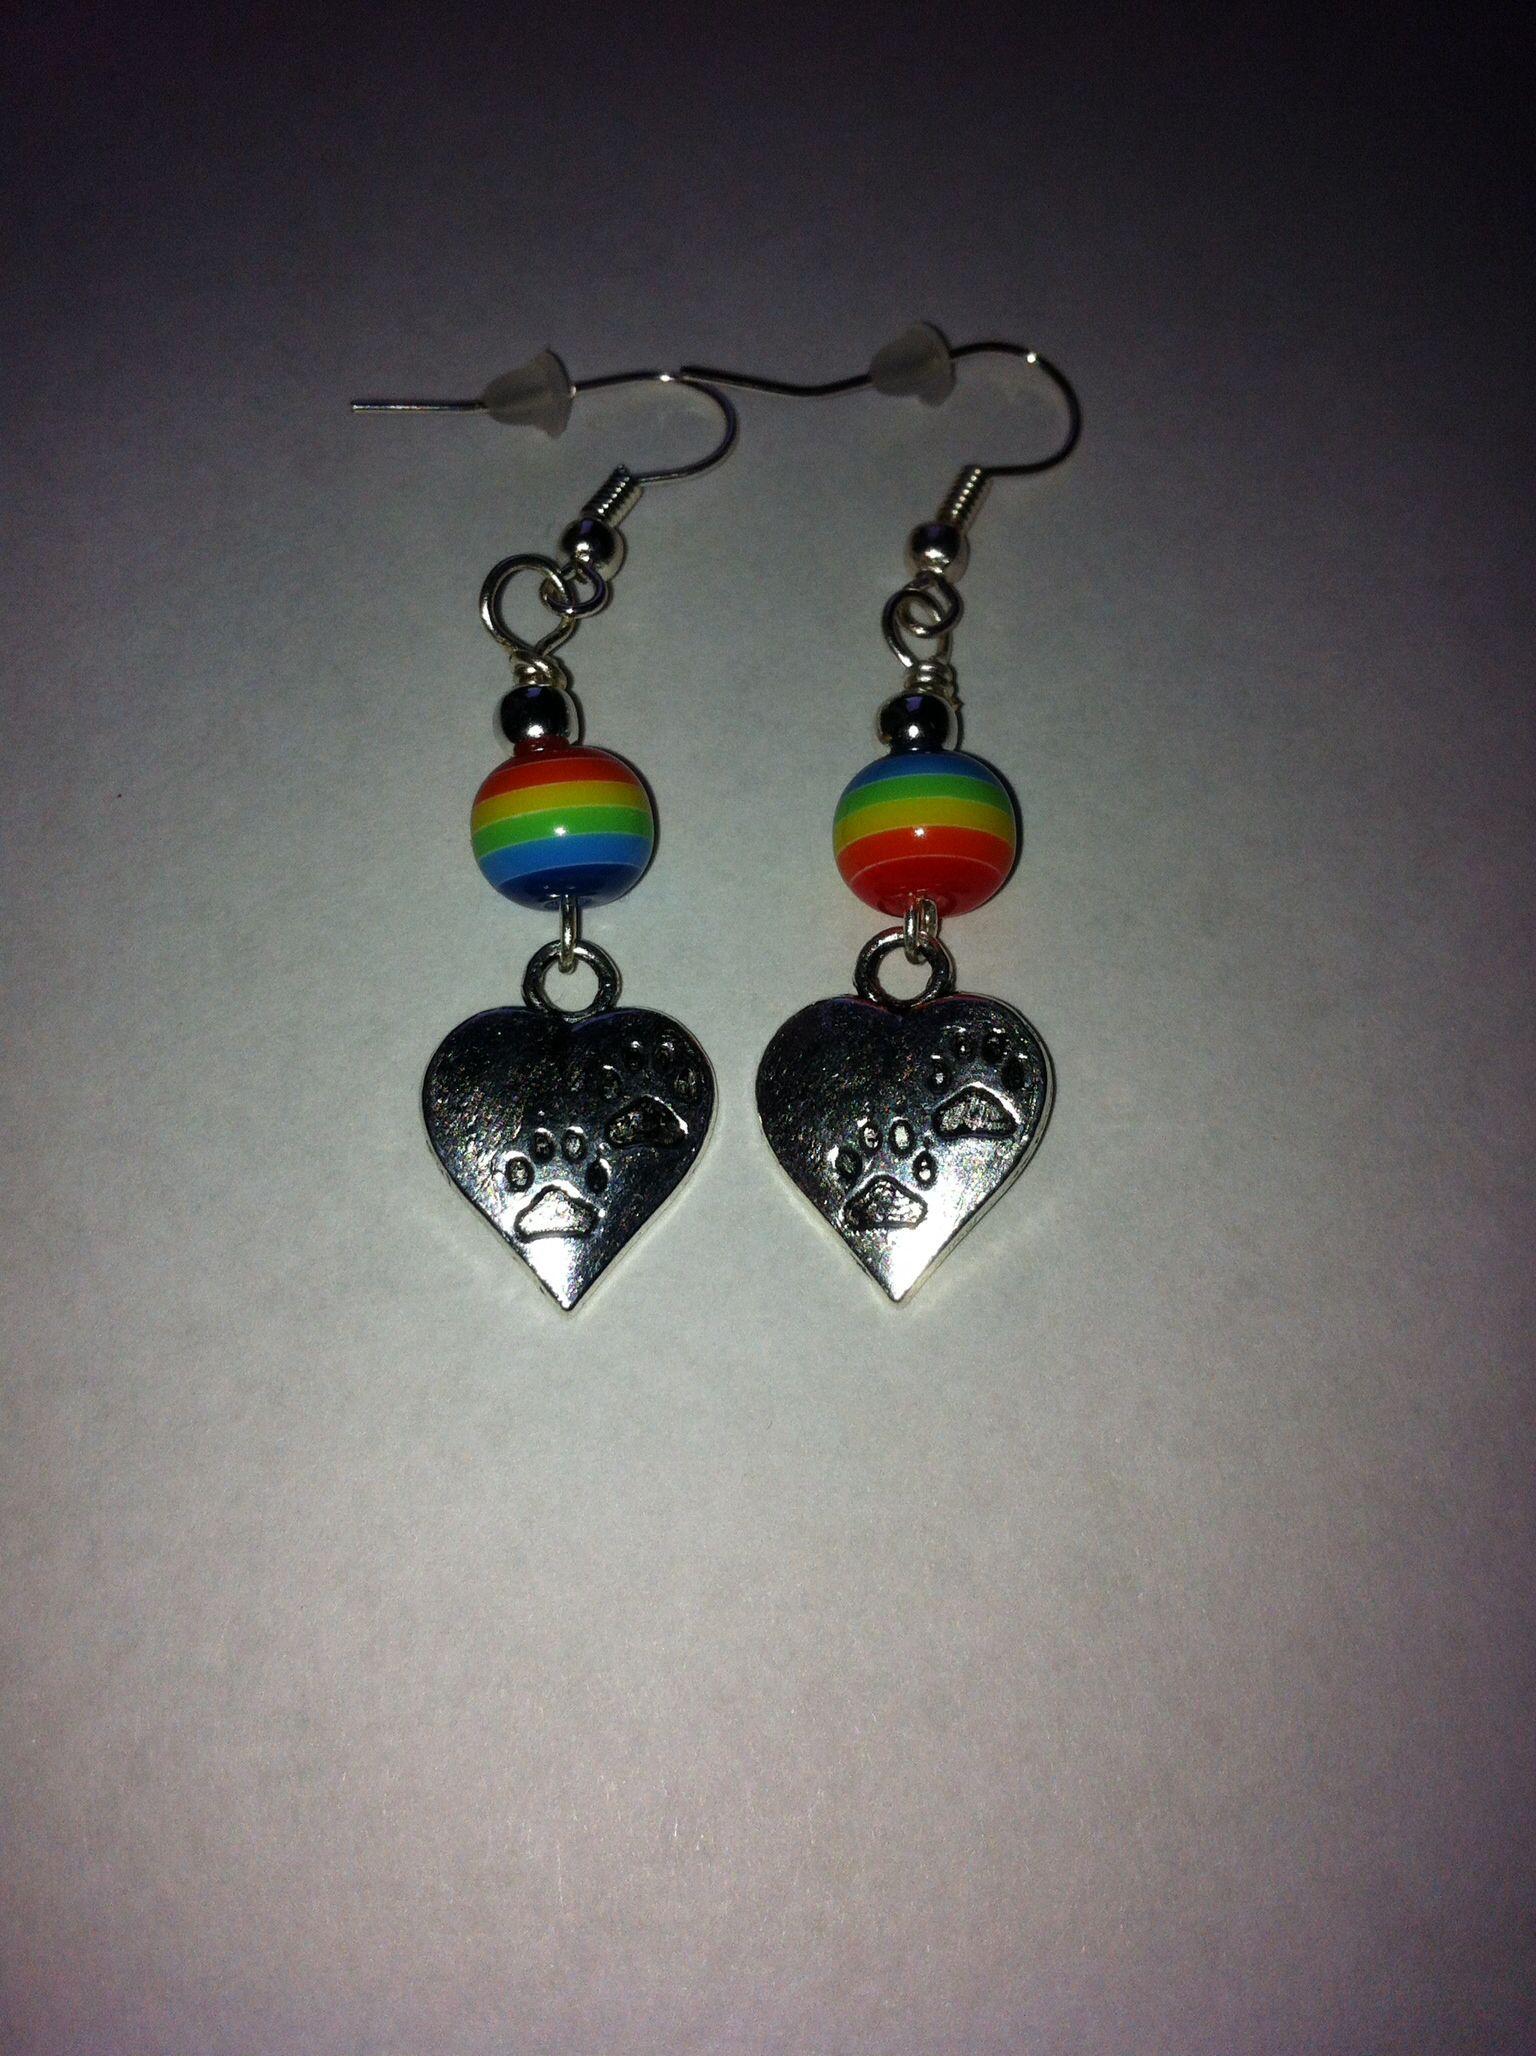 Rainbow beads and pawprint heart charm earrings #etsy, #MoggysMall, #heart, #pawprints, #rainbow, #cat, #earrings